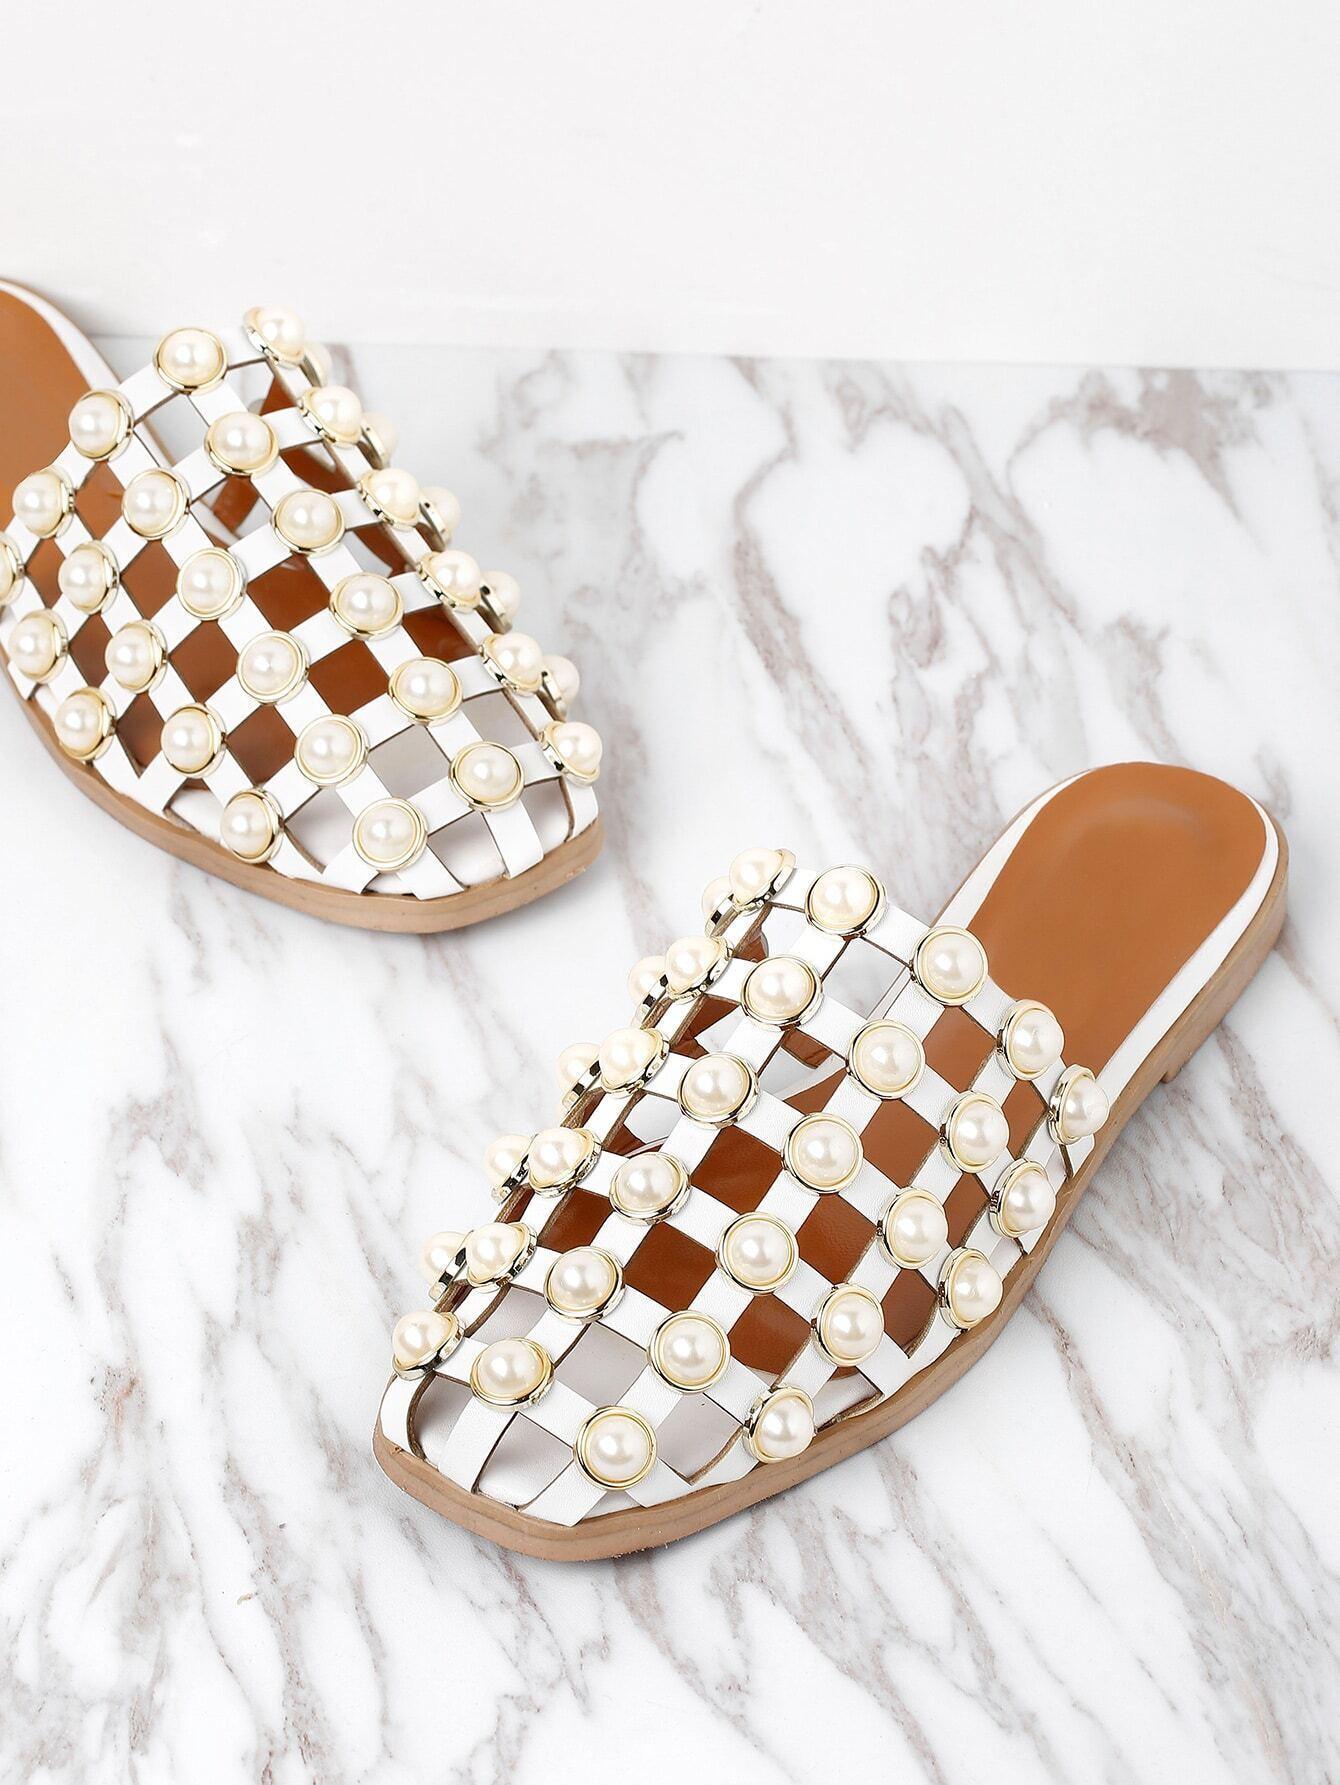 b9c3d6009f7 Faux Pearl Embellished Creux Sliders EmmaCloth-Women Fast Fashion Online